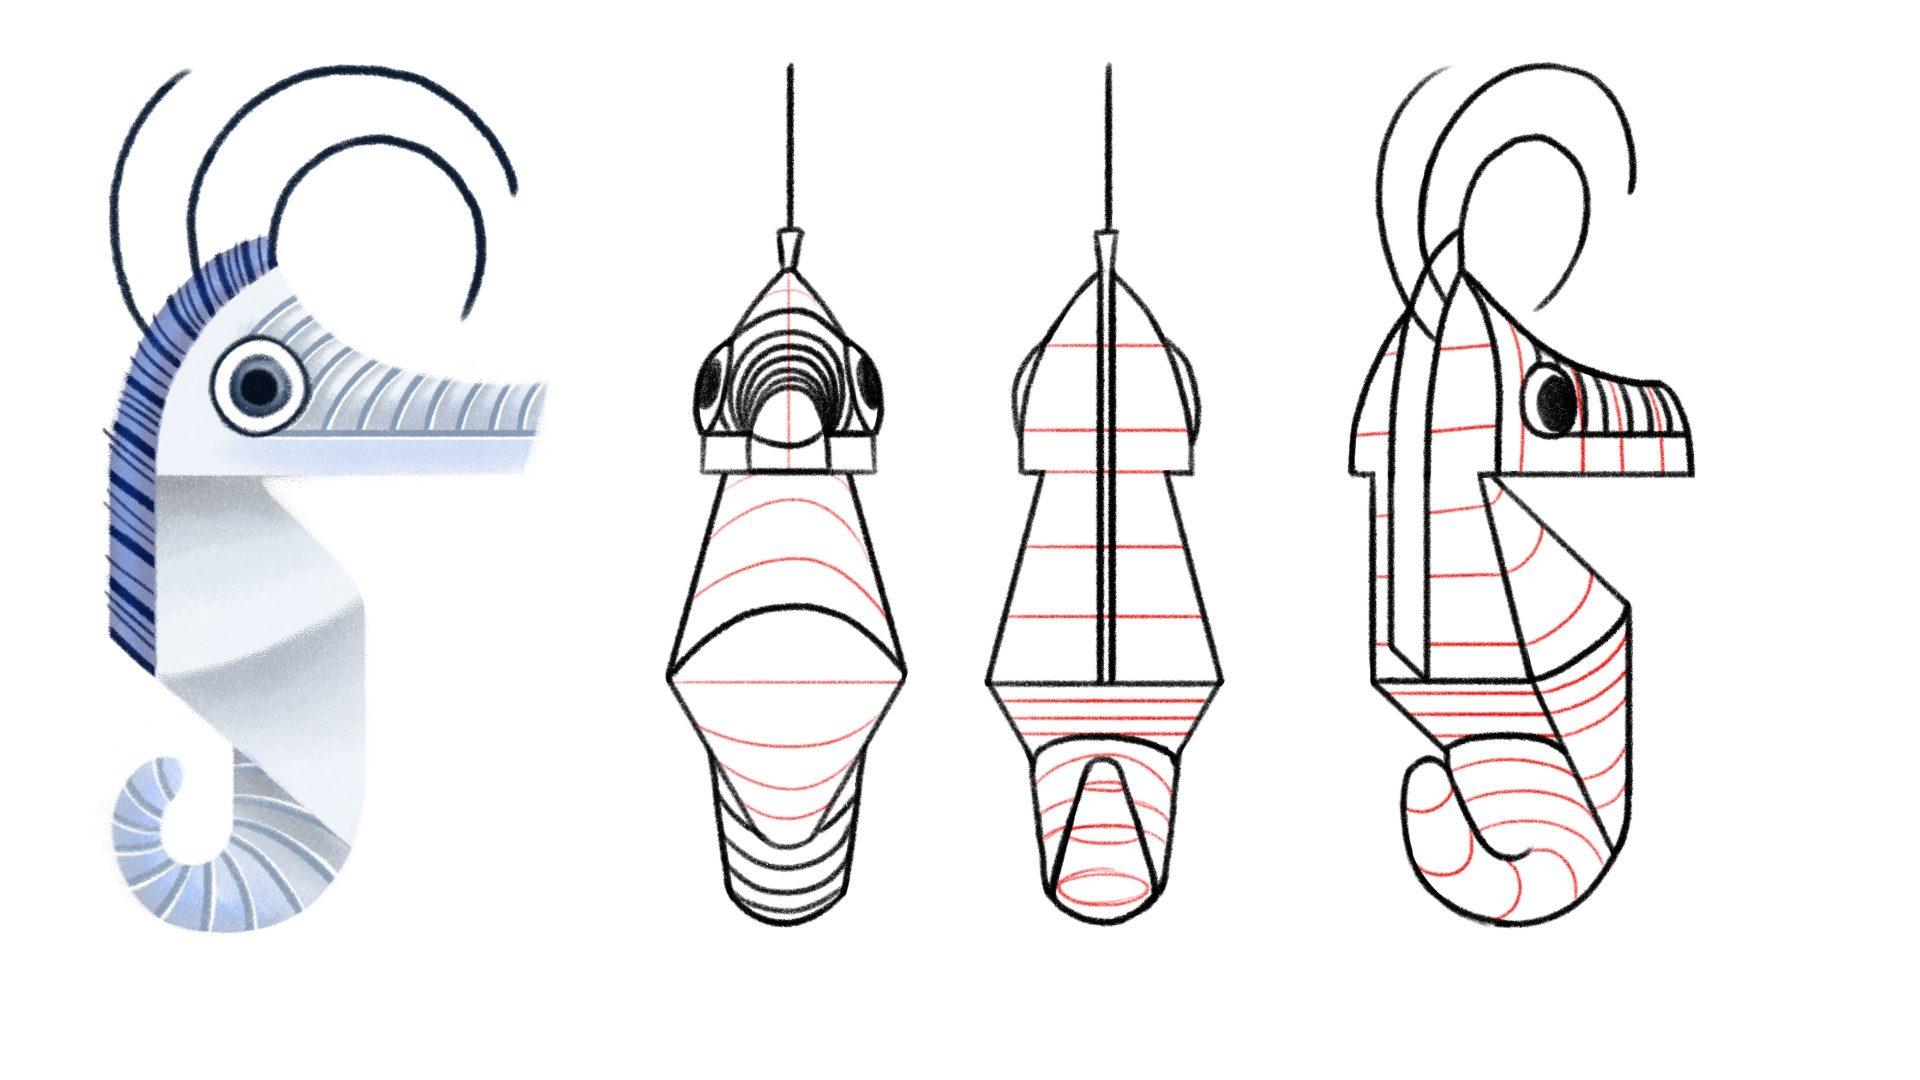 Asn Seahorse V22